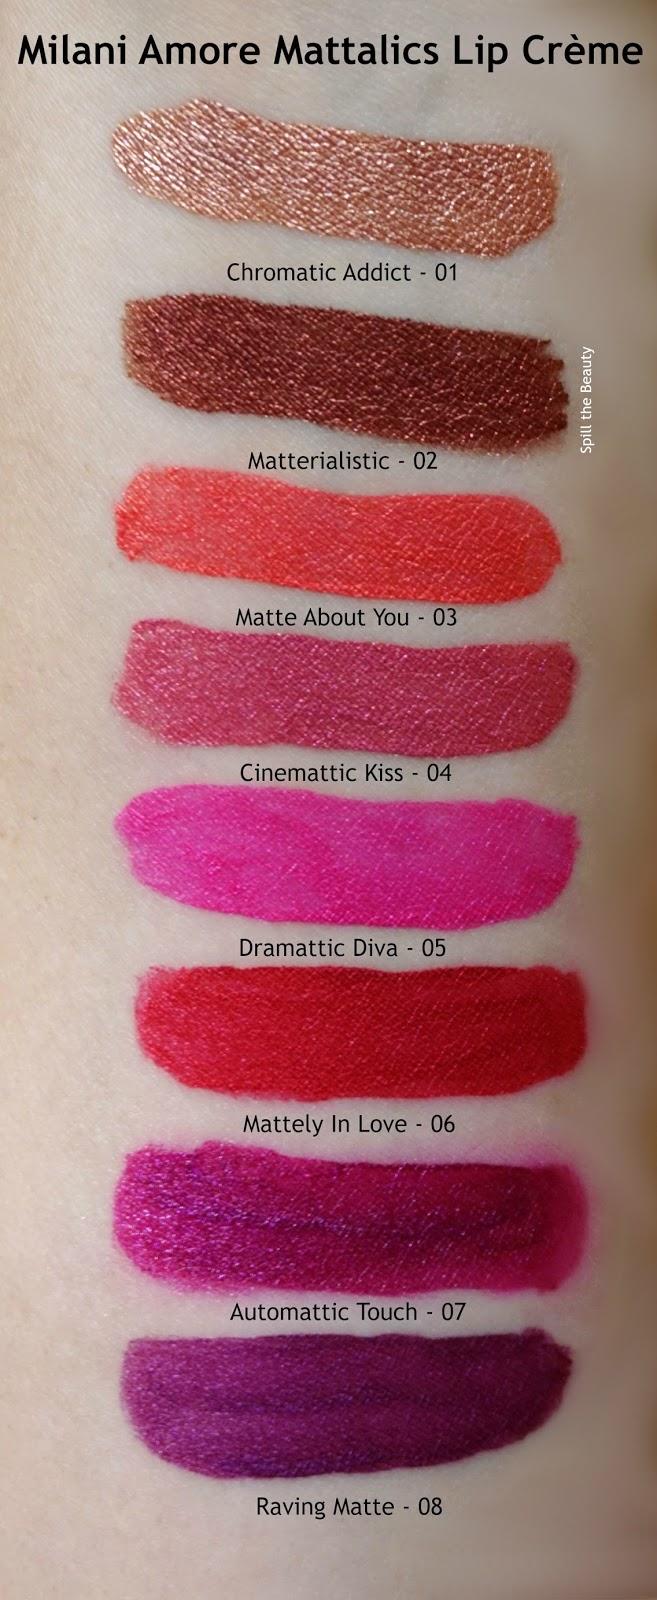 milani amore mattalic lip creme arm swatches review